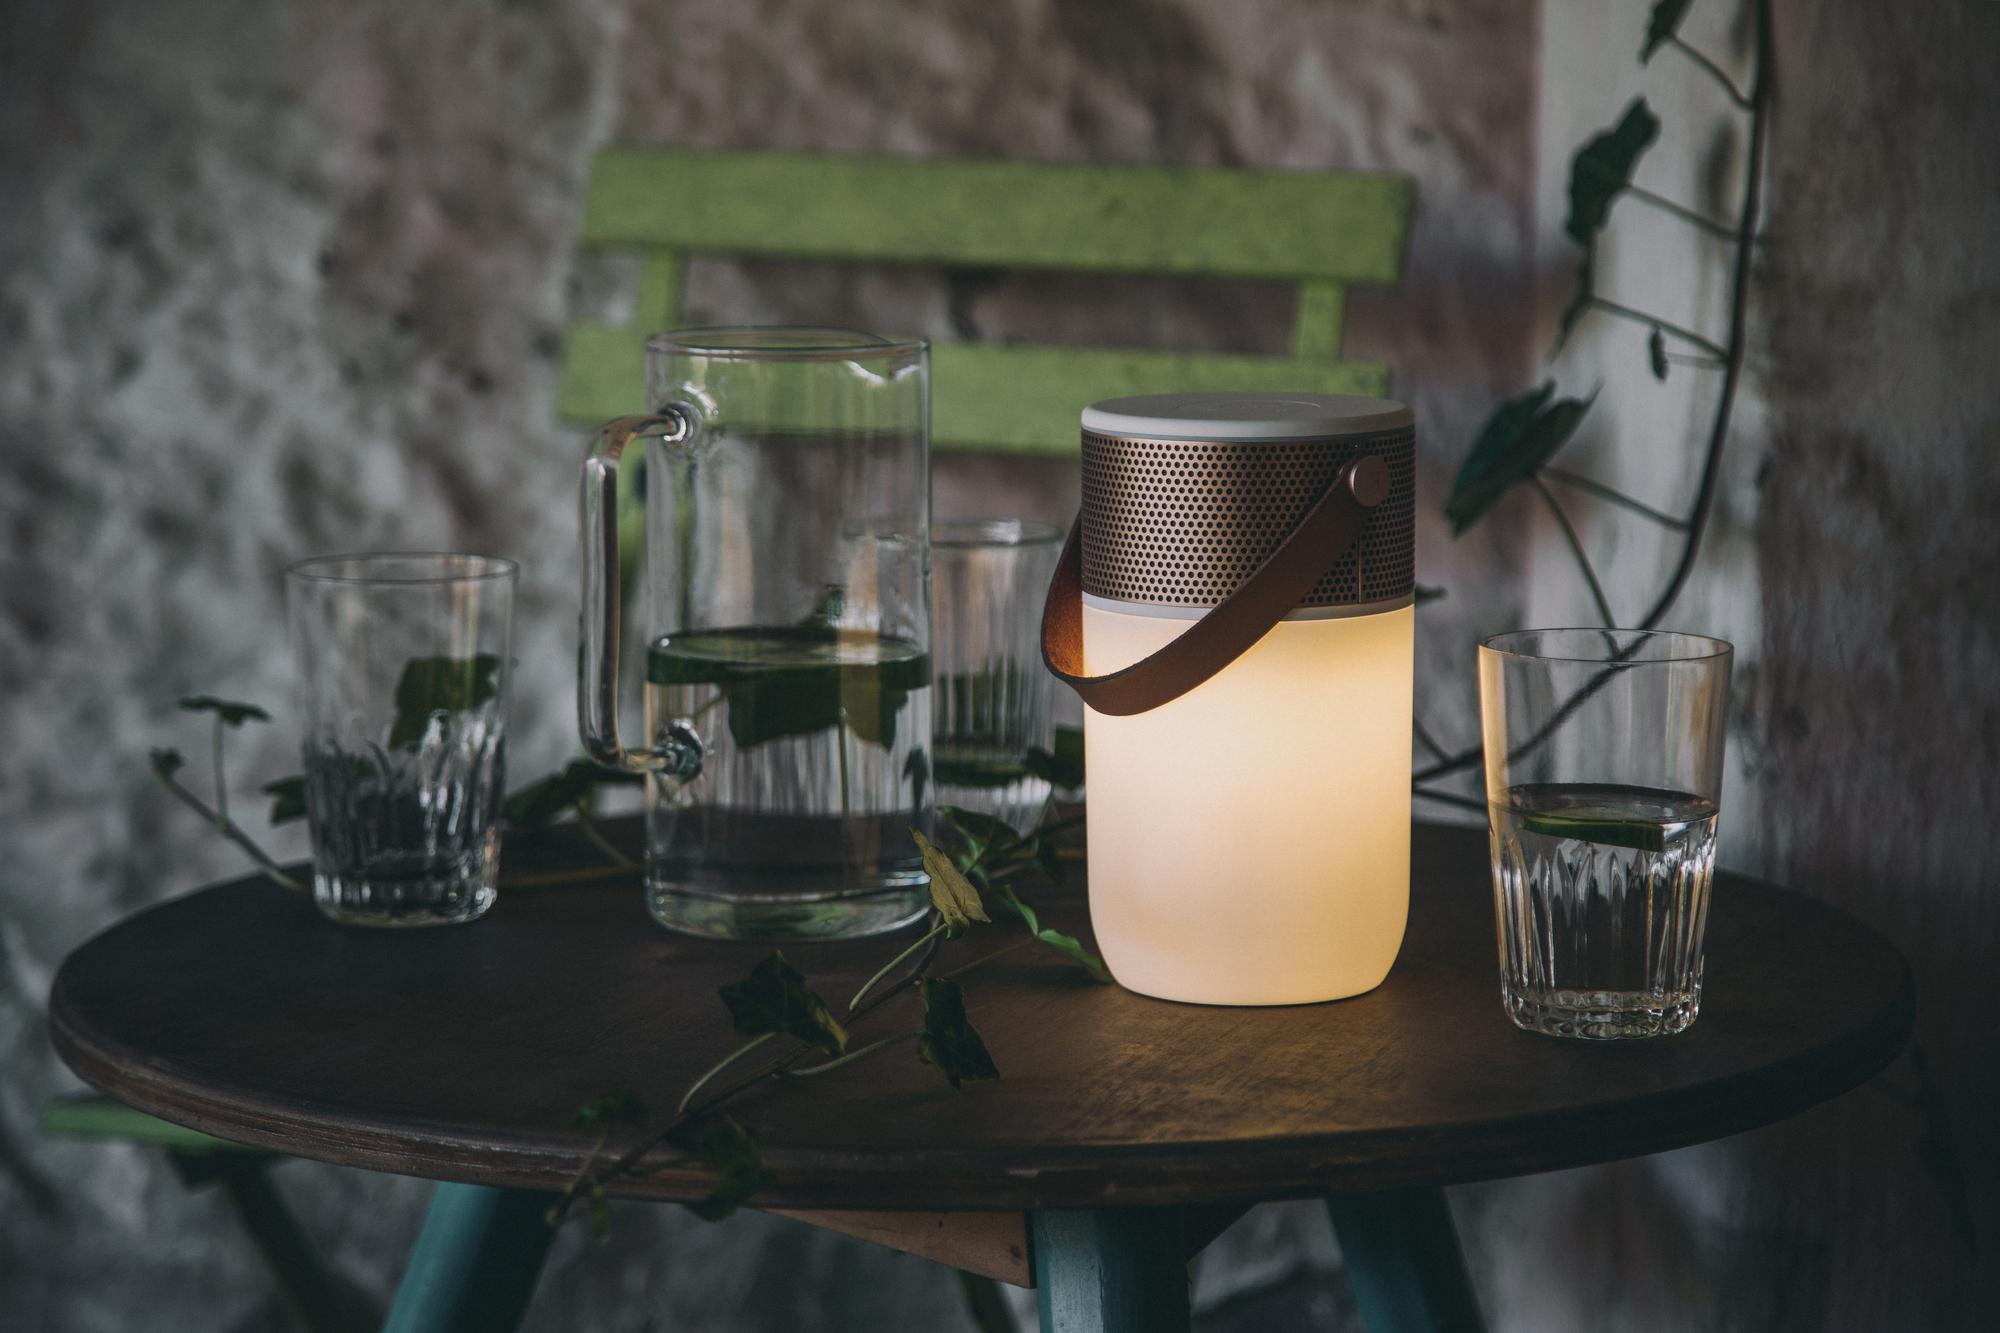 aGLOW Multifunctional Bluetooth LED Lautsprecher Kreafunk